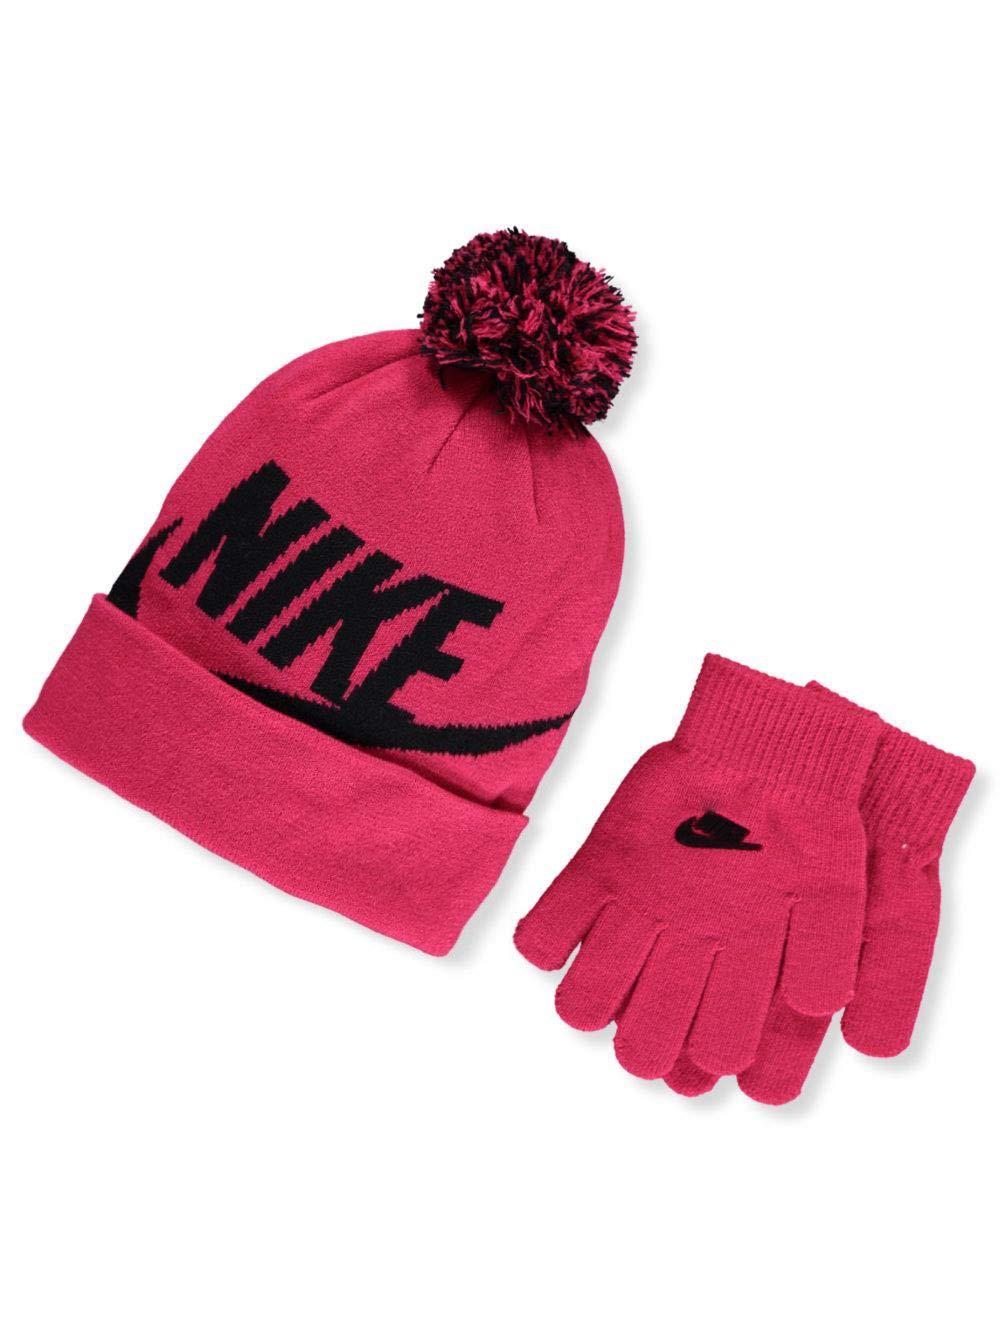 Nike Girls' Hat & Gloves Set (Youth One Size)